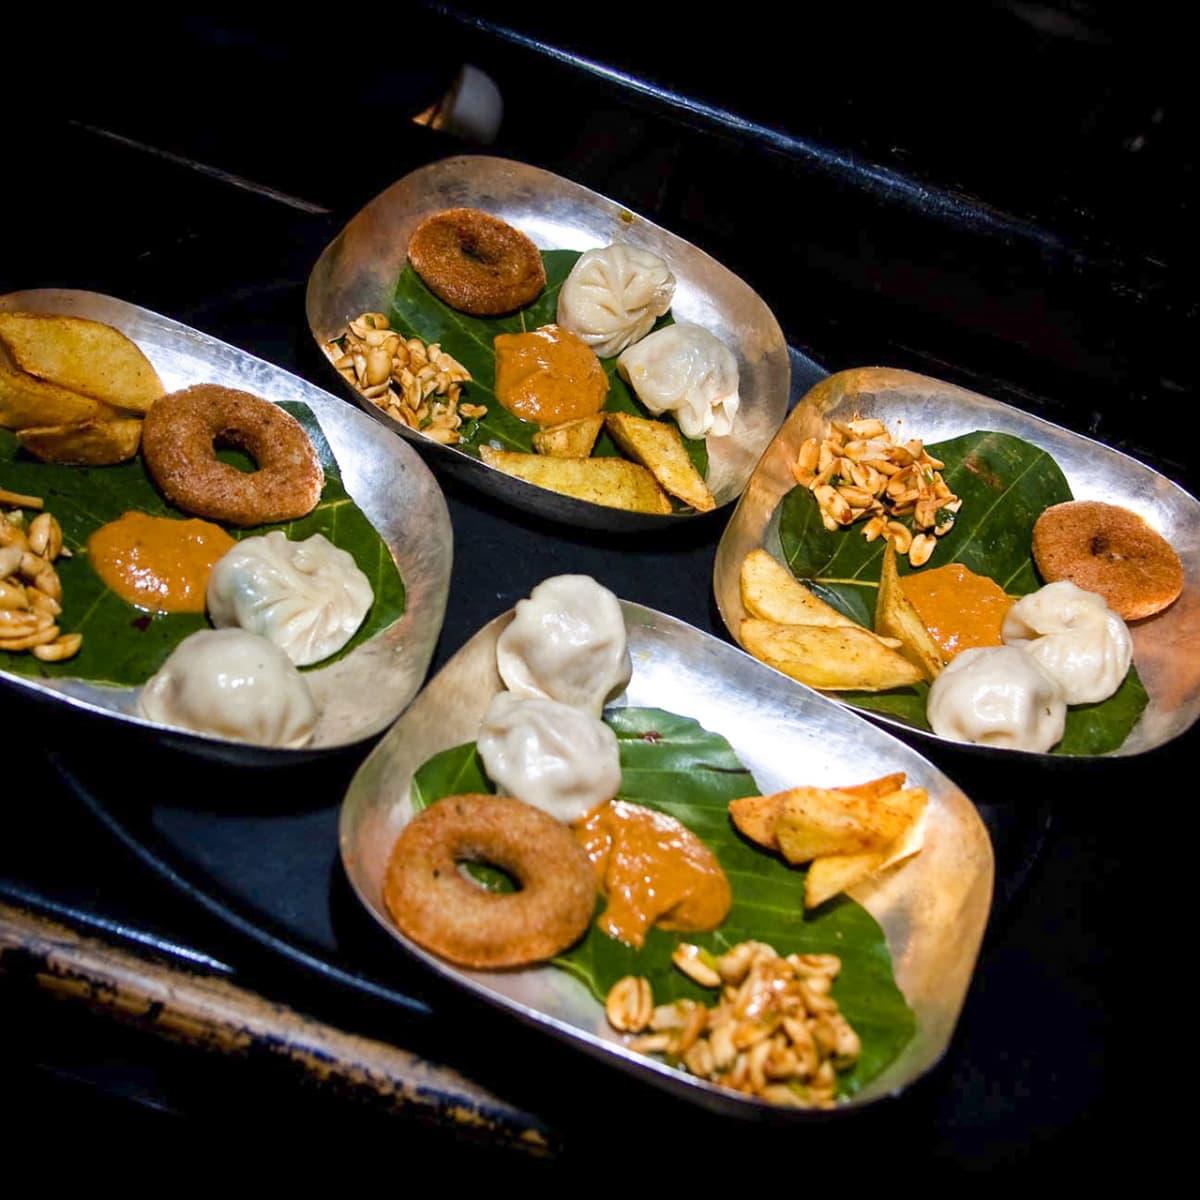 Nepalese Tattoo Inn Home: Local Organic Food In A Homey Setting